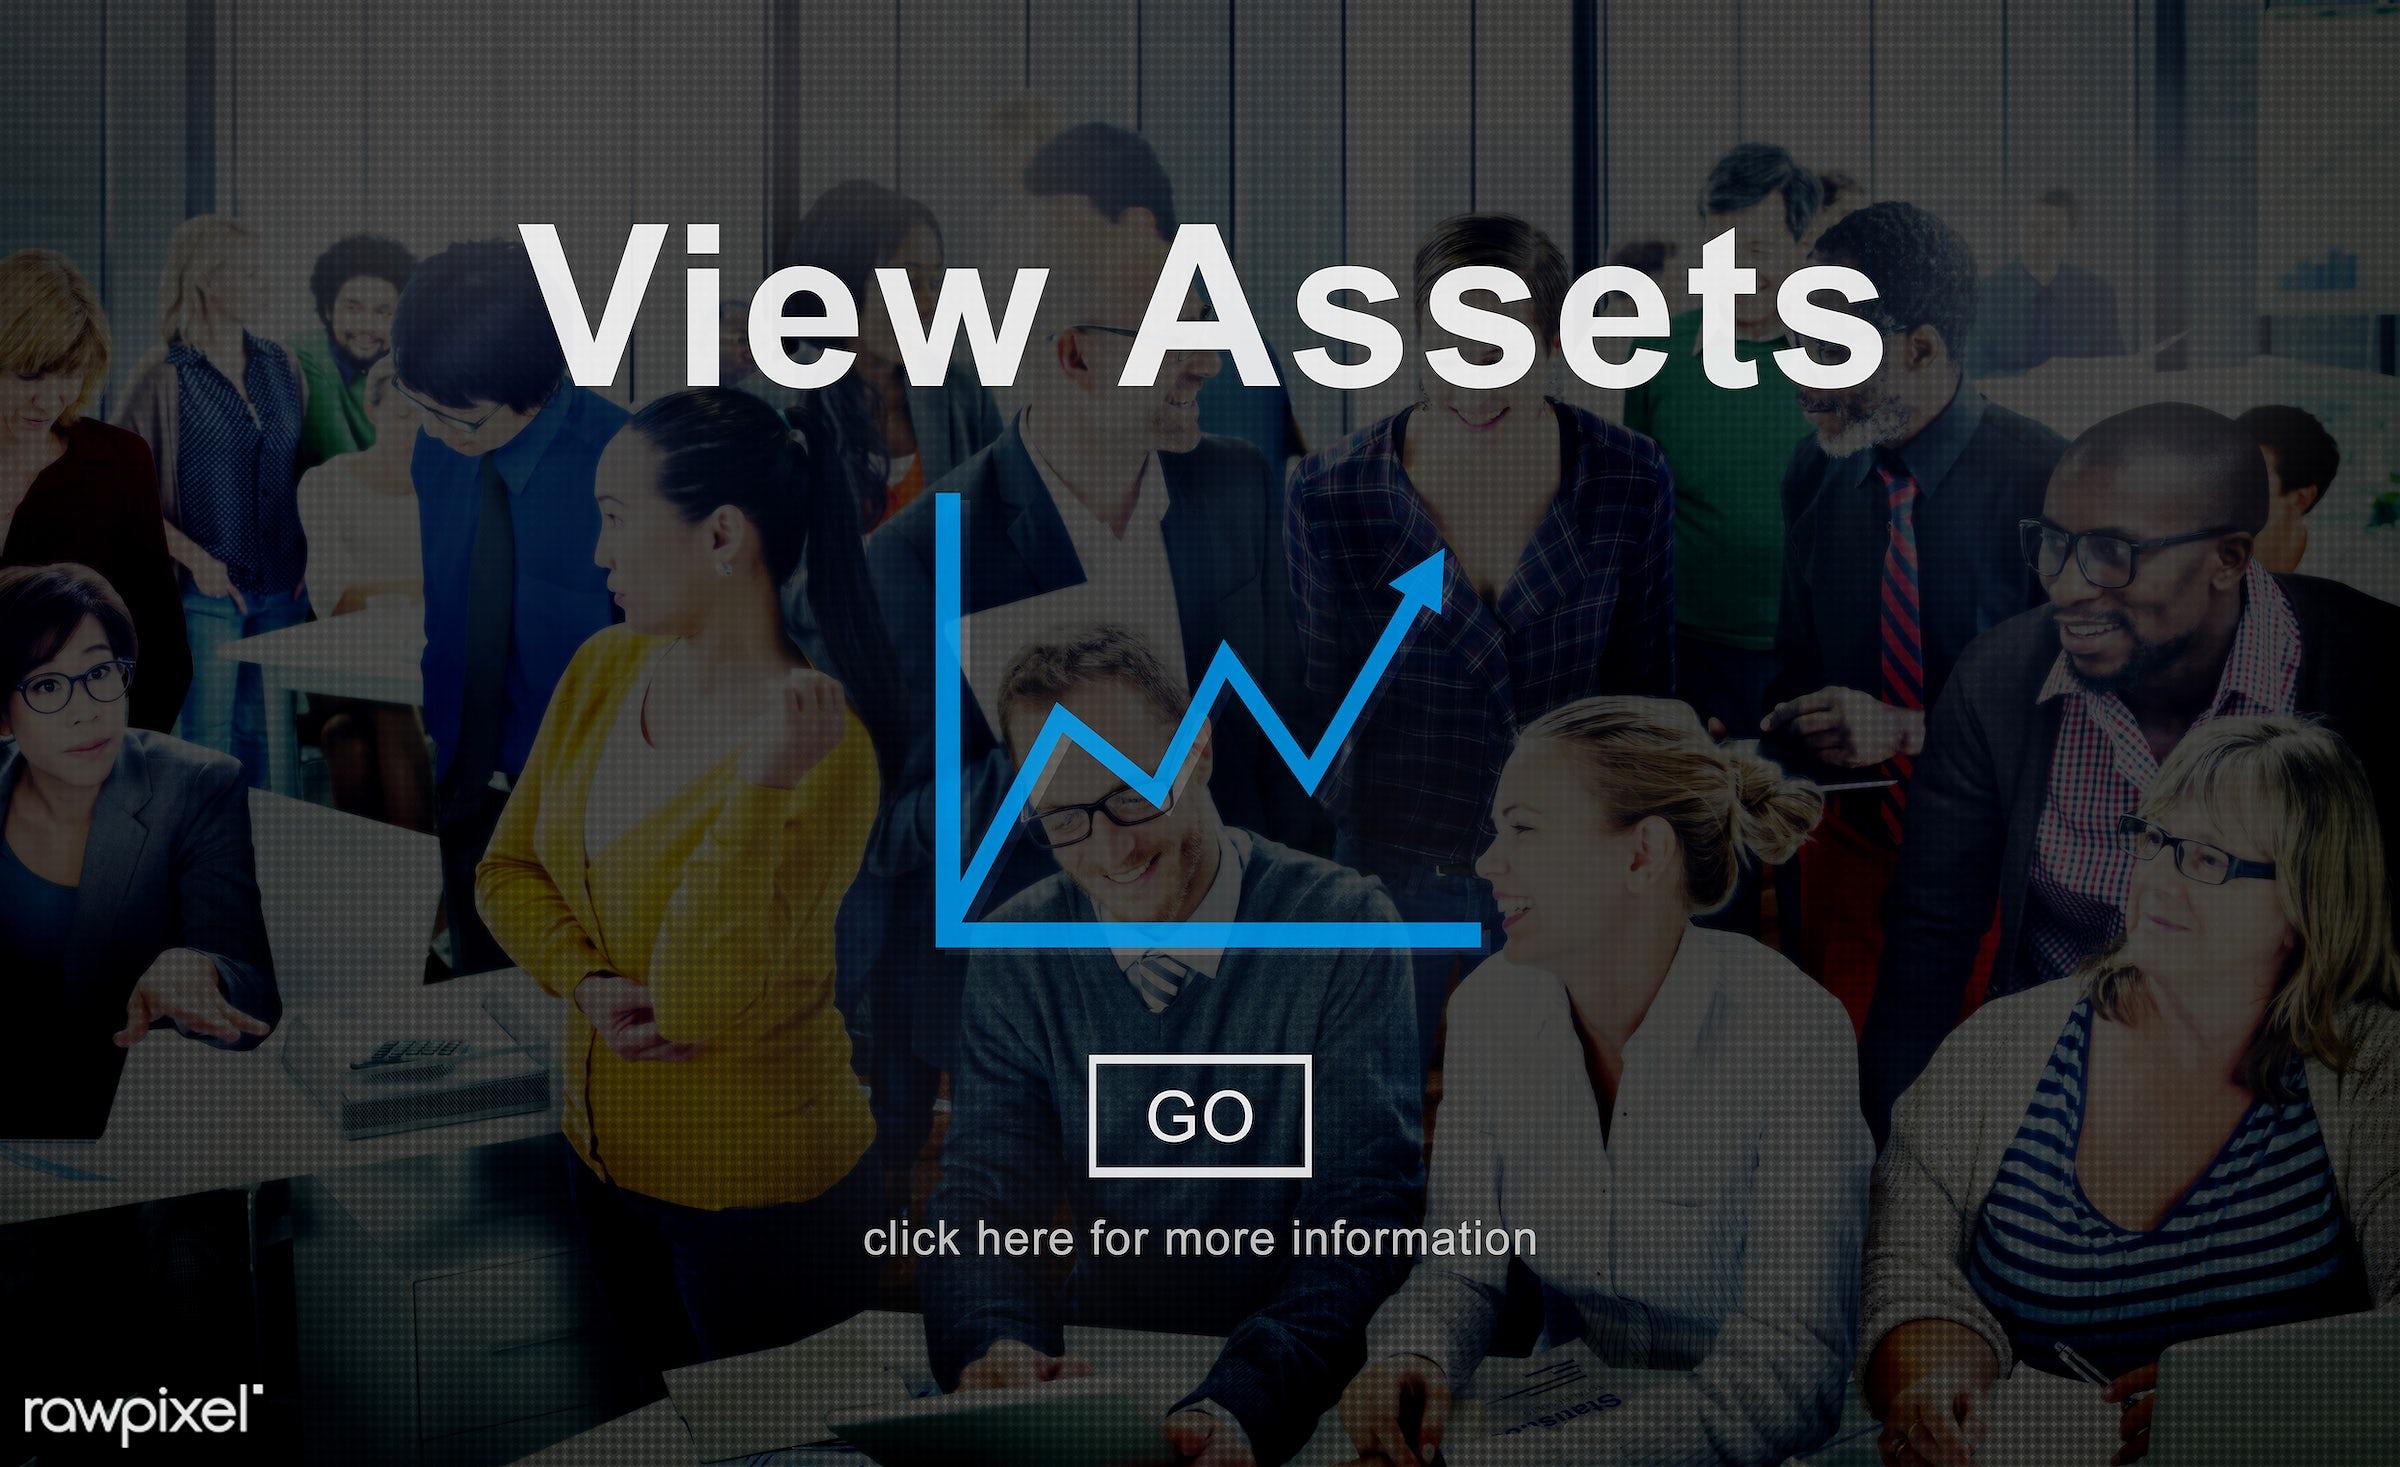 accounting, advantage, african descent, analysis, asian ethnicity, assets, bar graph, benefit, bonus, bookkeeping, business...